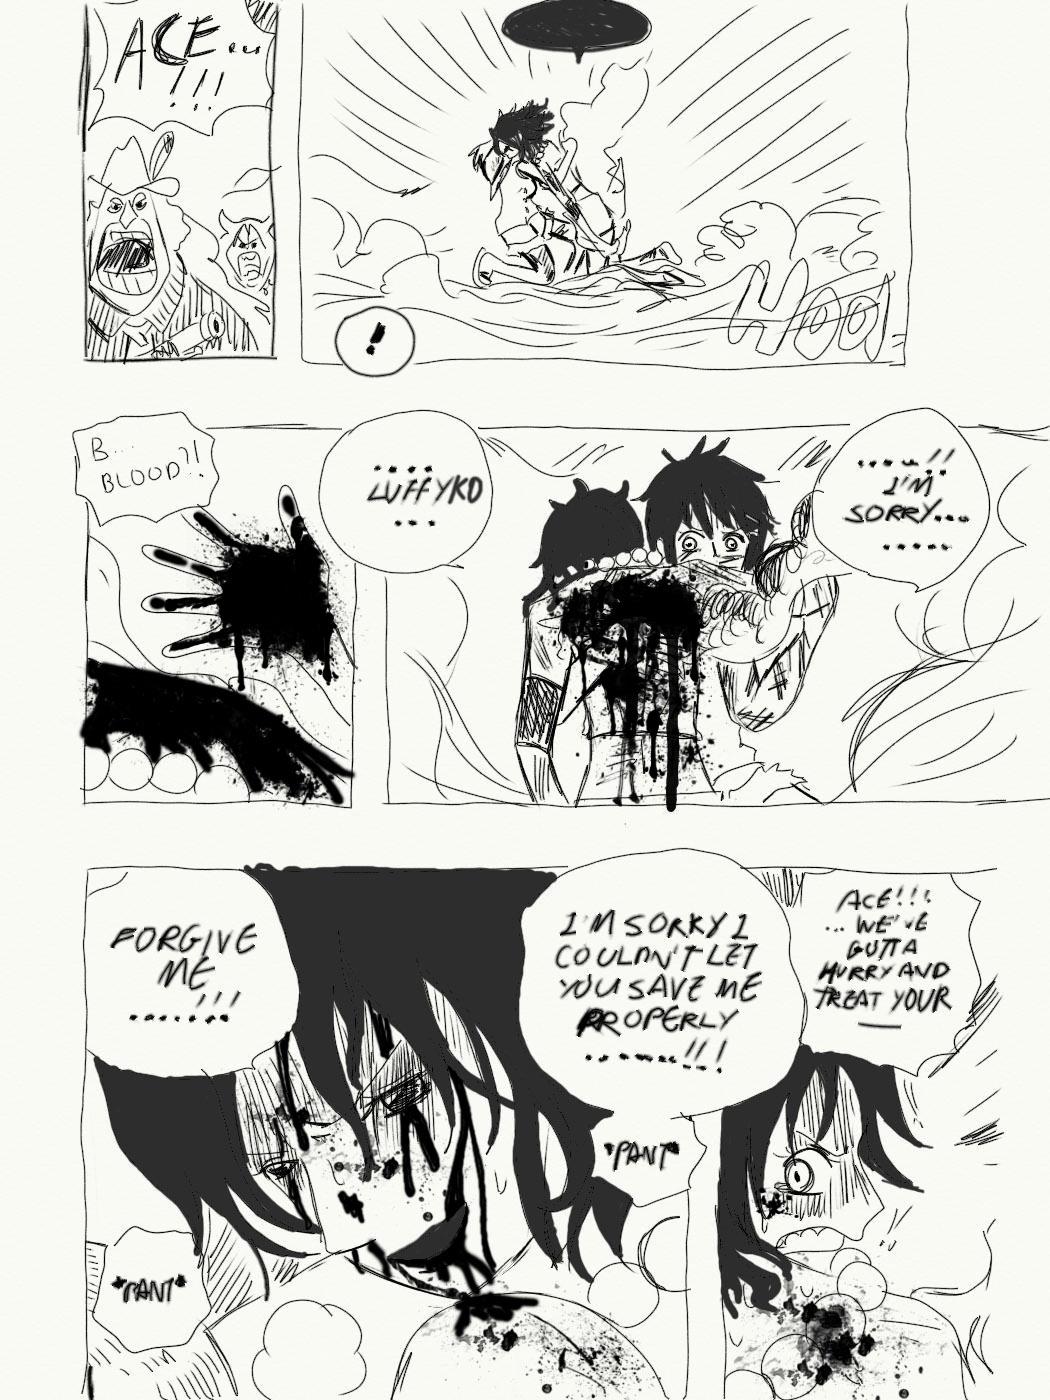 ace death:female ver by Geena-the-Hedgehog on DeviantArt